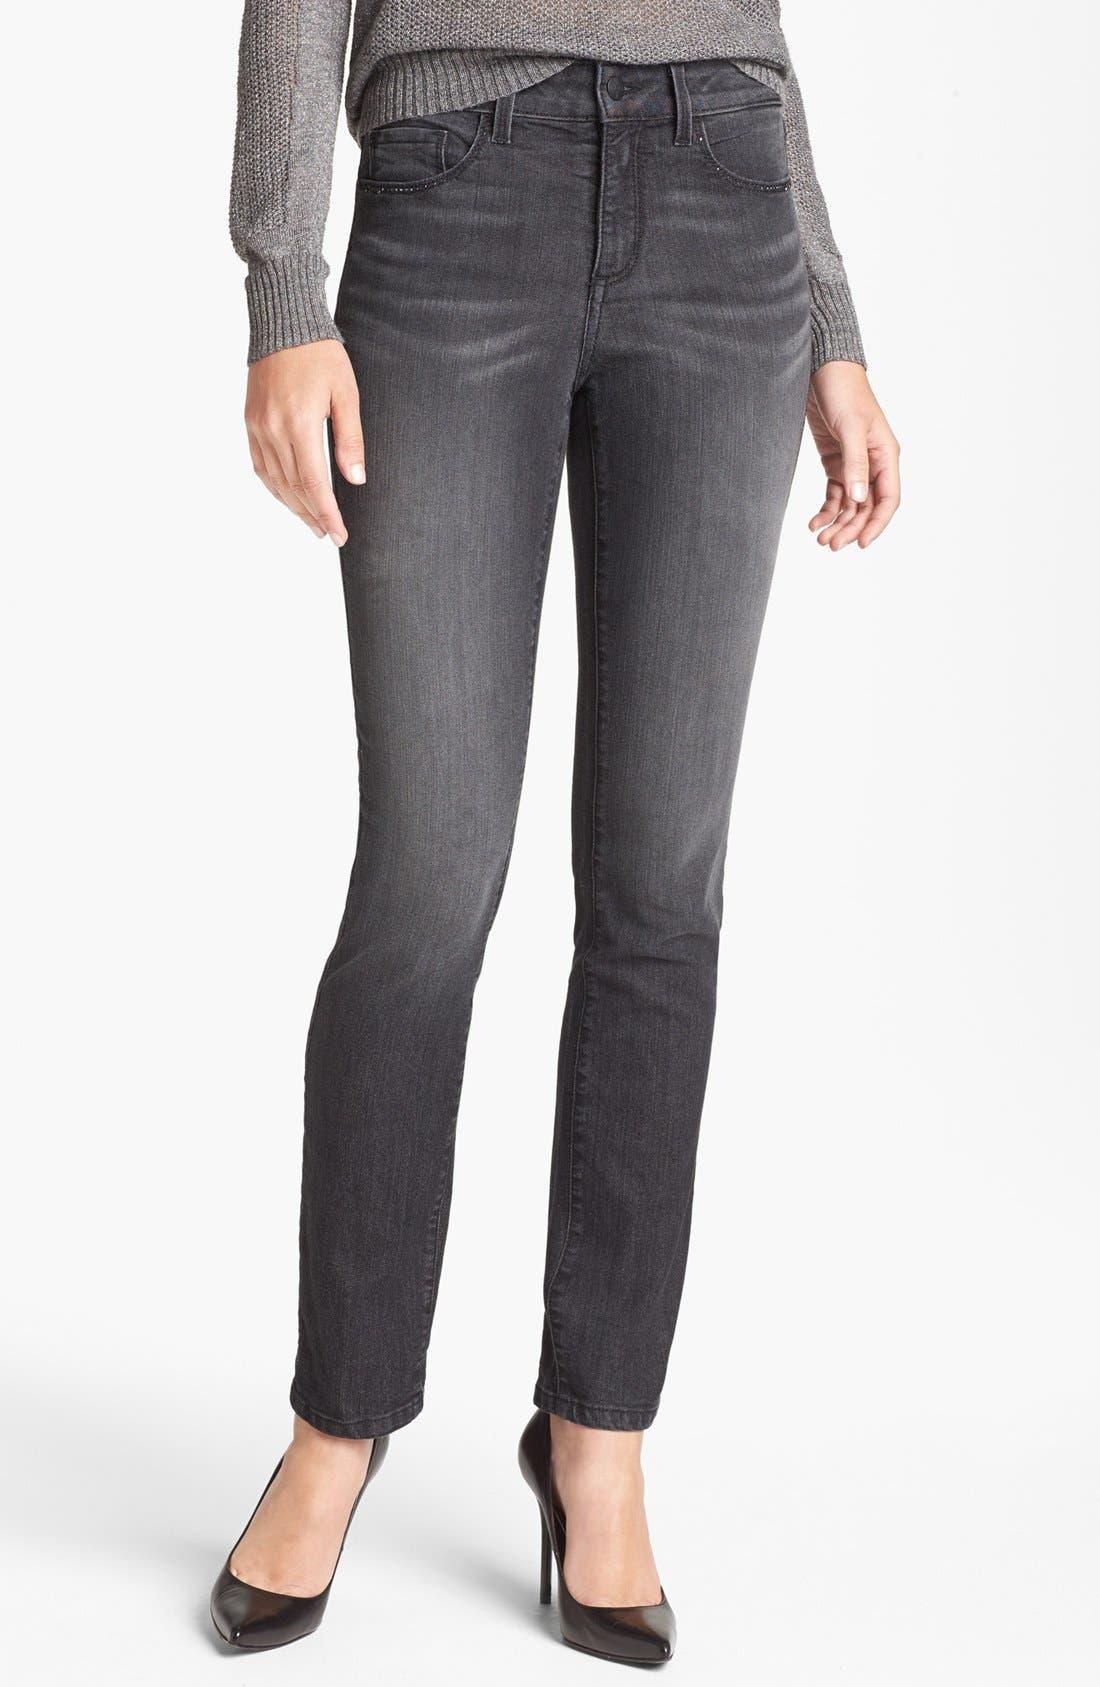 Main Image - NYDJ 'Alina' Stretch Skinny Jeans (Raven)